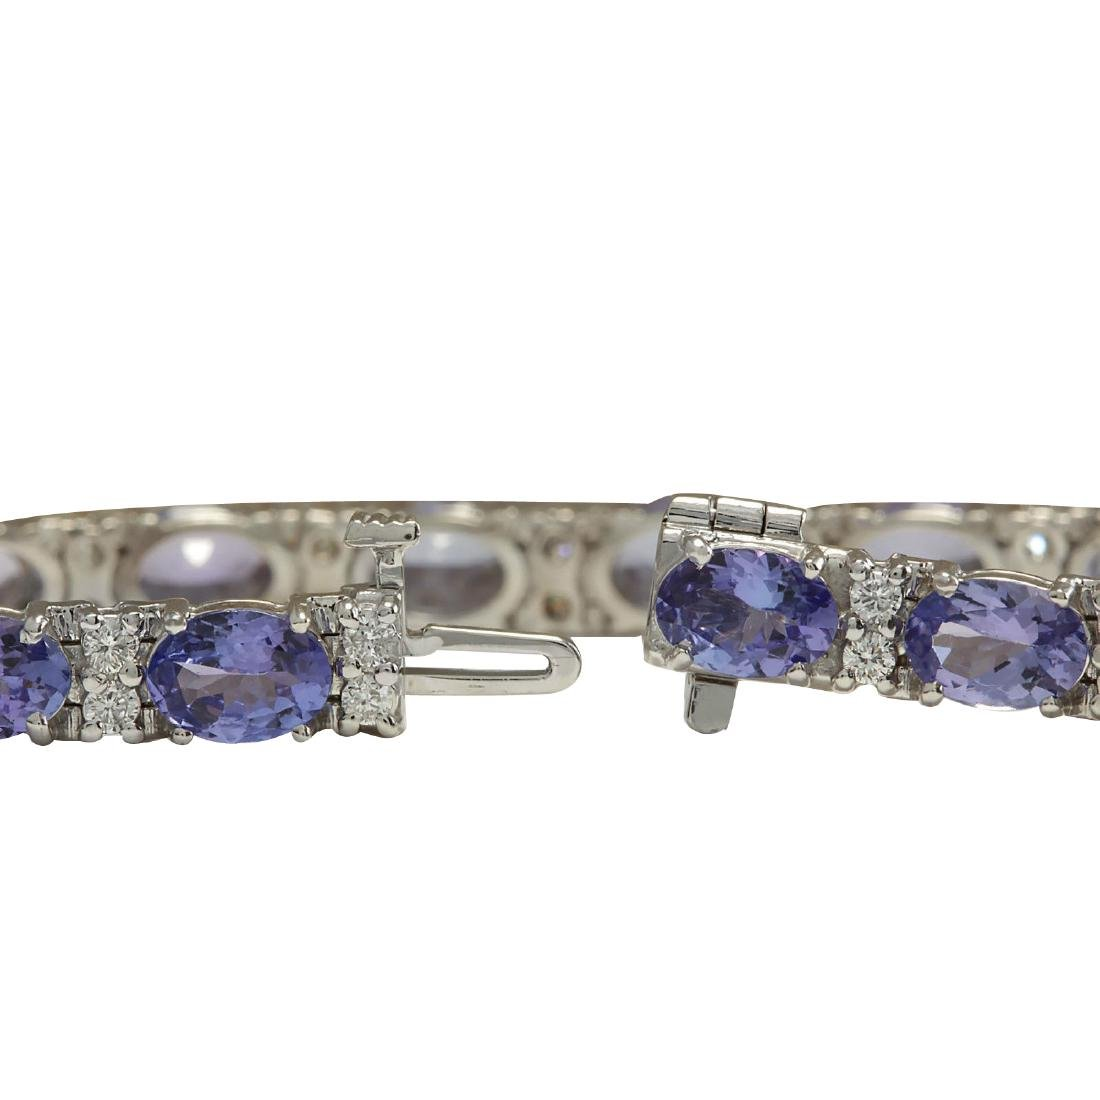 15.95CTW Natural Tanzanite And Diamond Bracelet In 18K - 2